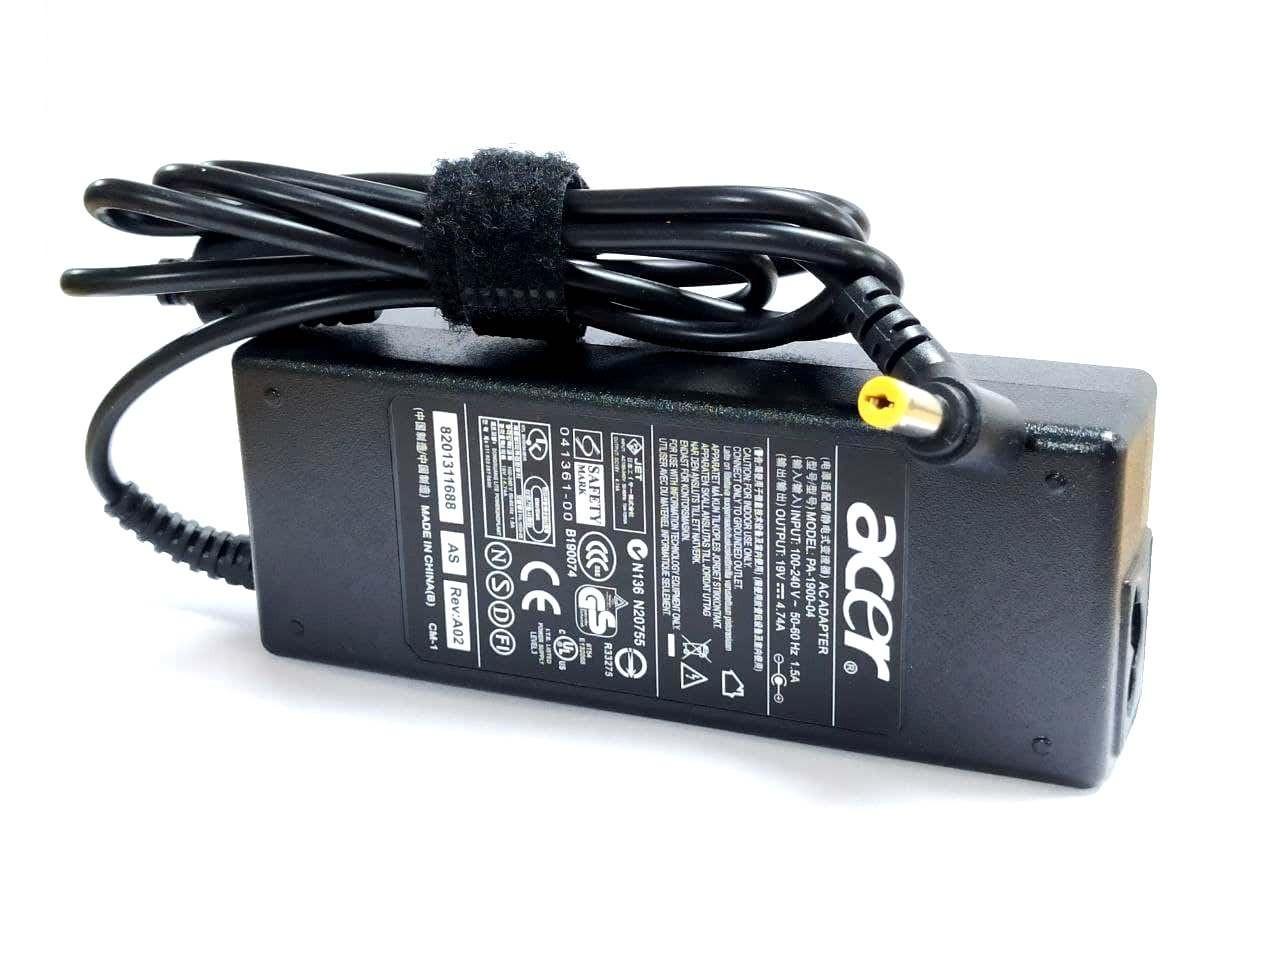 Блок питания для ноутбука Acer Aspire 8730ZG 19V 4.74A 90W